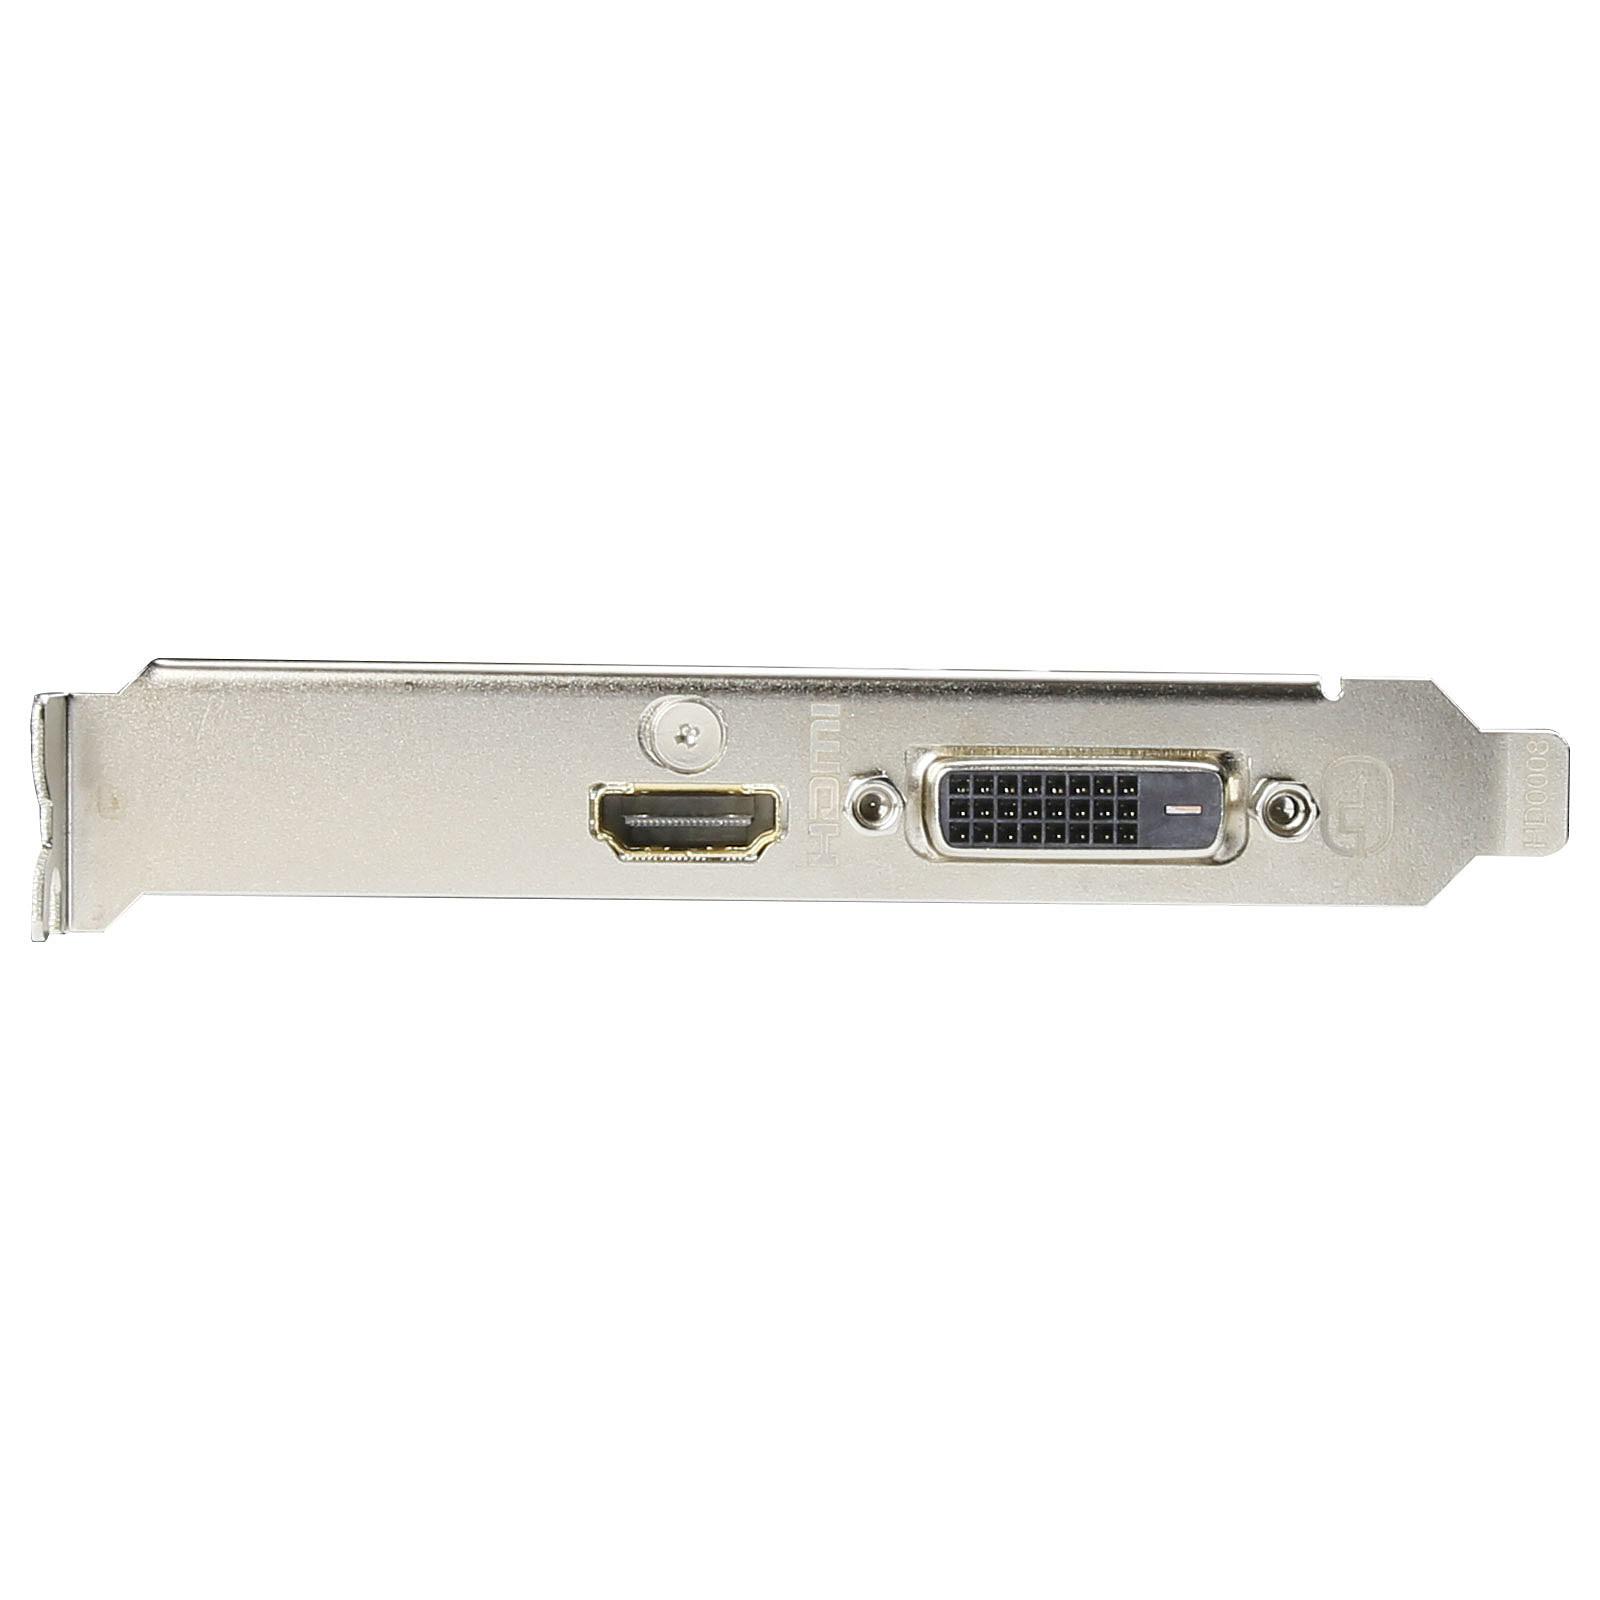 Gigabyte GT 1030 Low Profile D4 2G 2Go - Carte graphique Gigabyte - 1